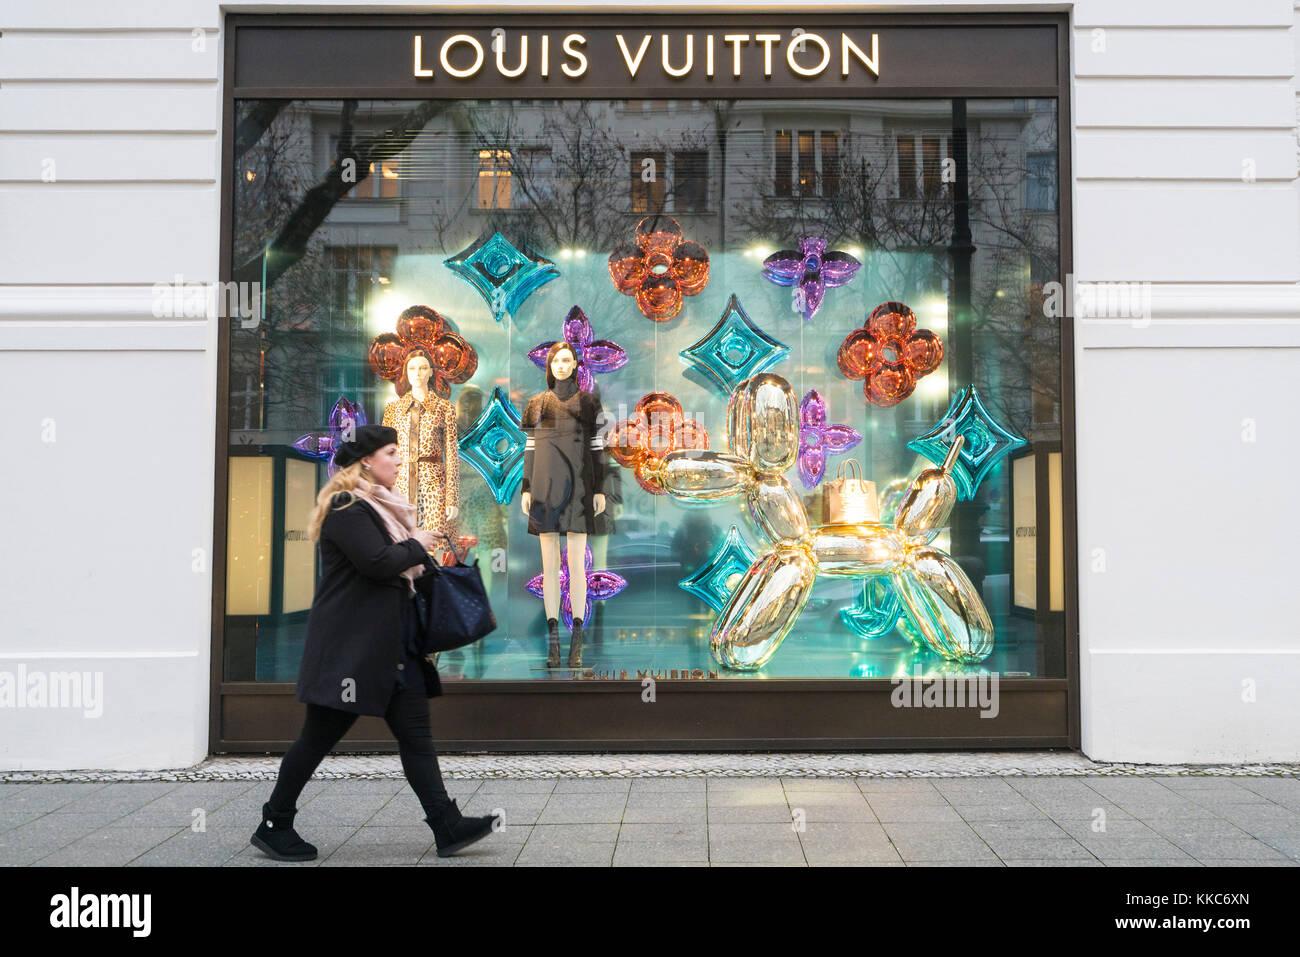 9abab344a8e0d Louis Vuitton boutique on famous shopping street Kurfurstendamm ...